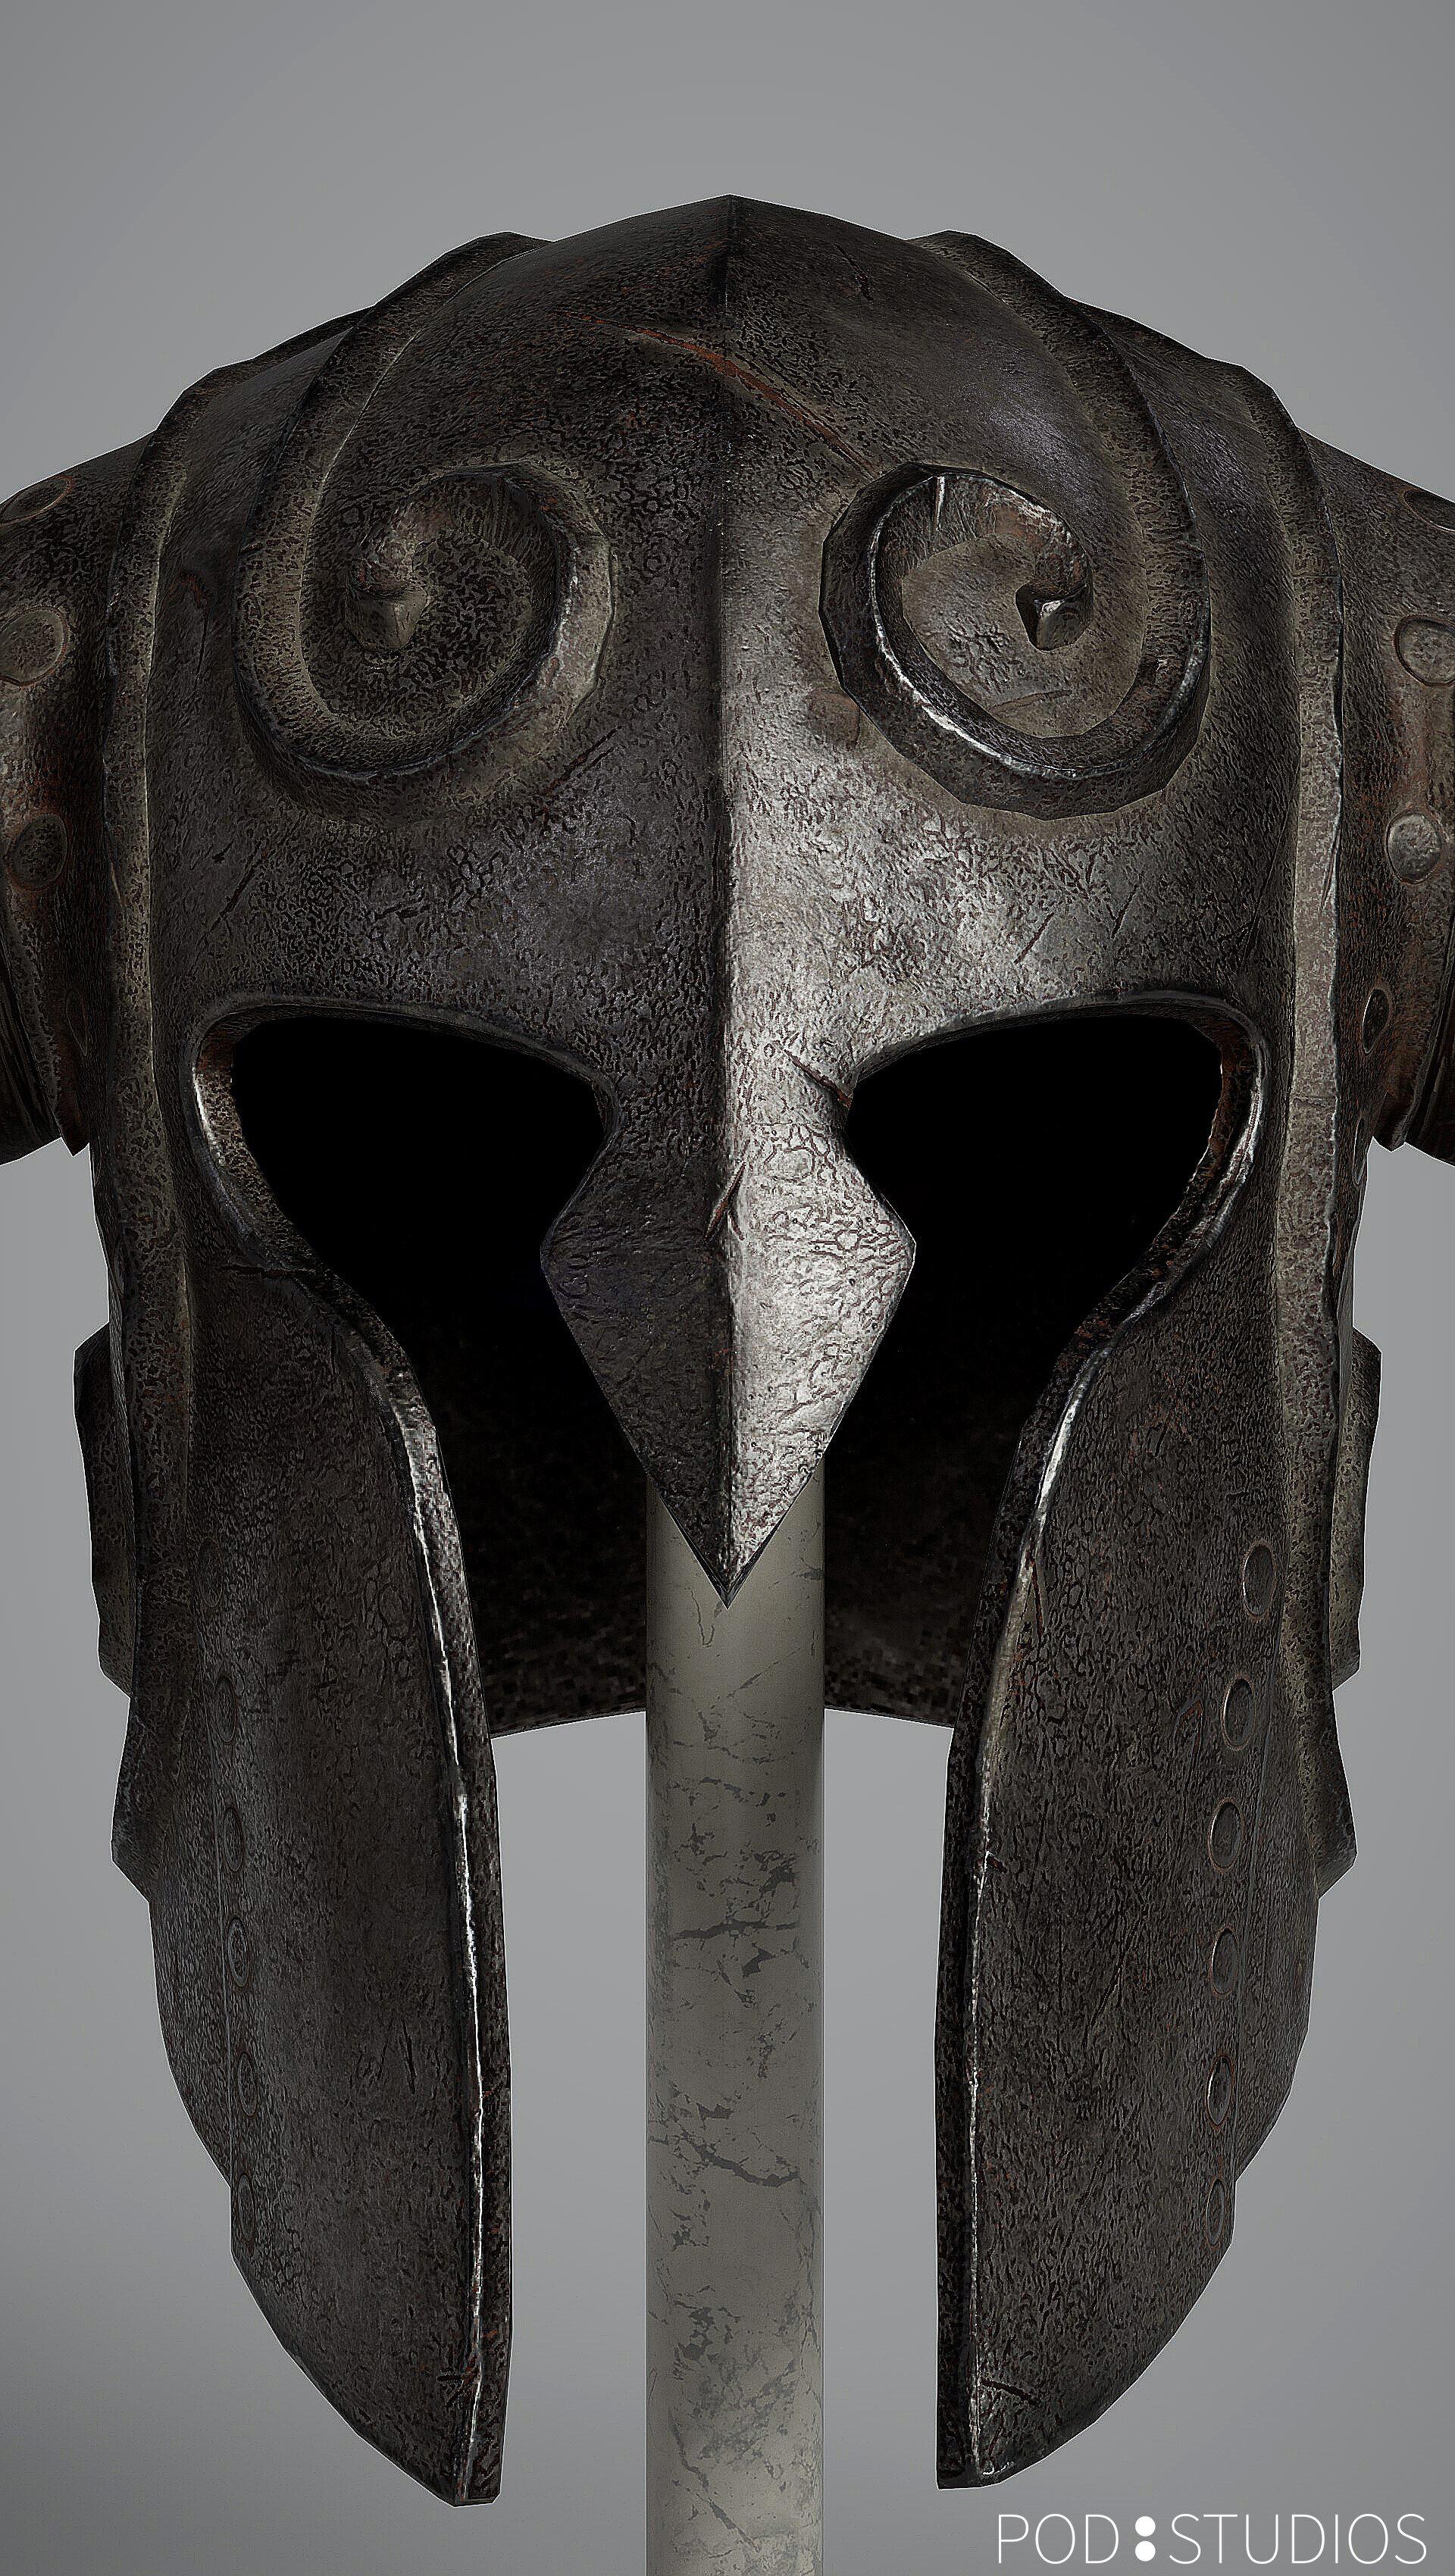 pod-8-ancienthelmetp8-3.jpg